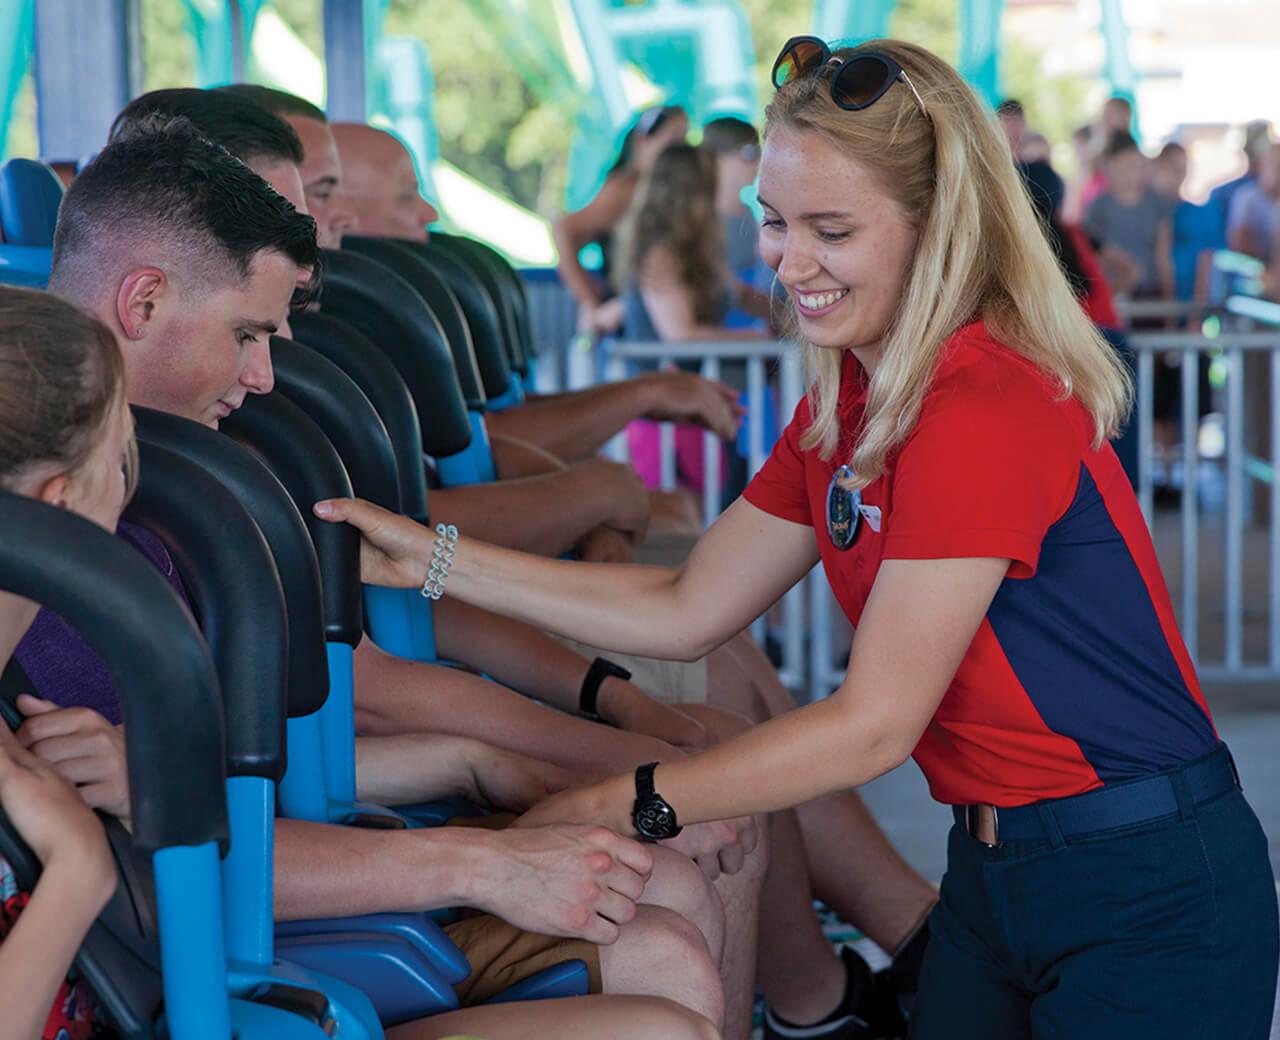 Cedar fair employee securing people on a roller coaster